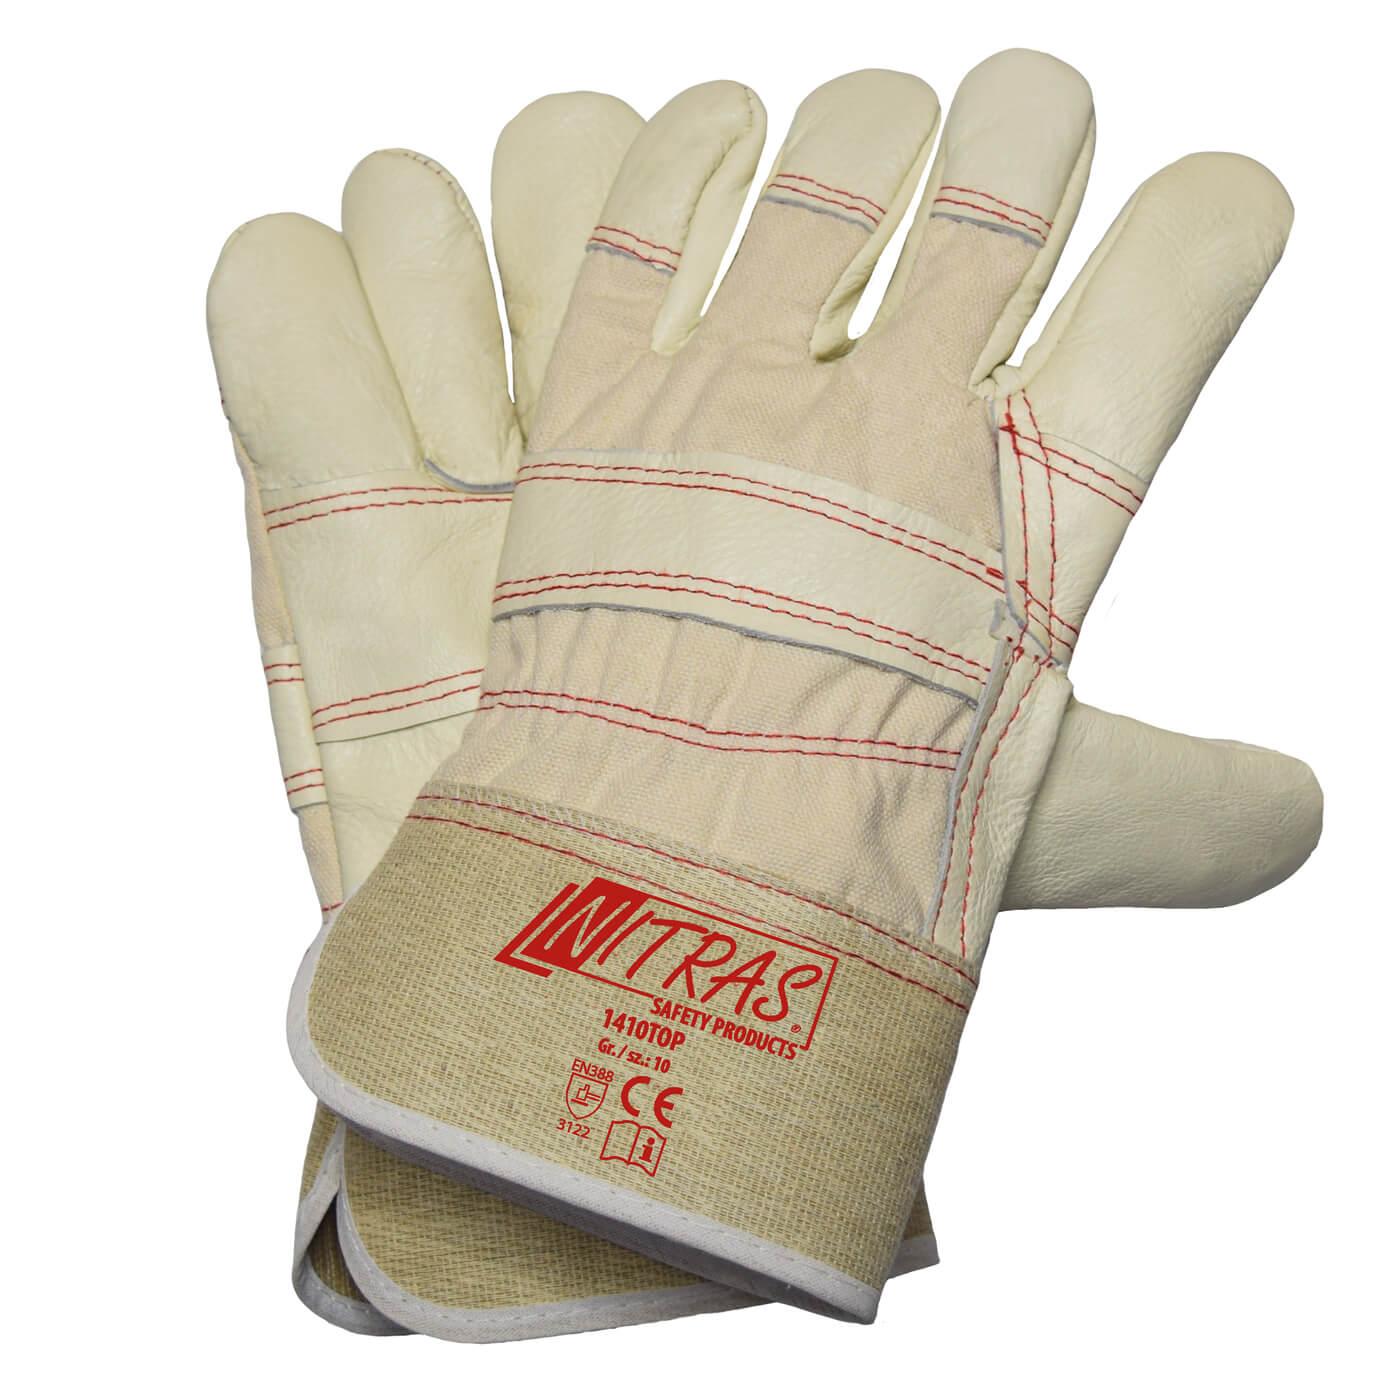 Rękawice skórzane Nitras 1410TOP